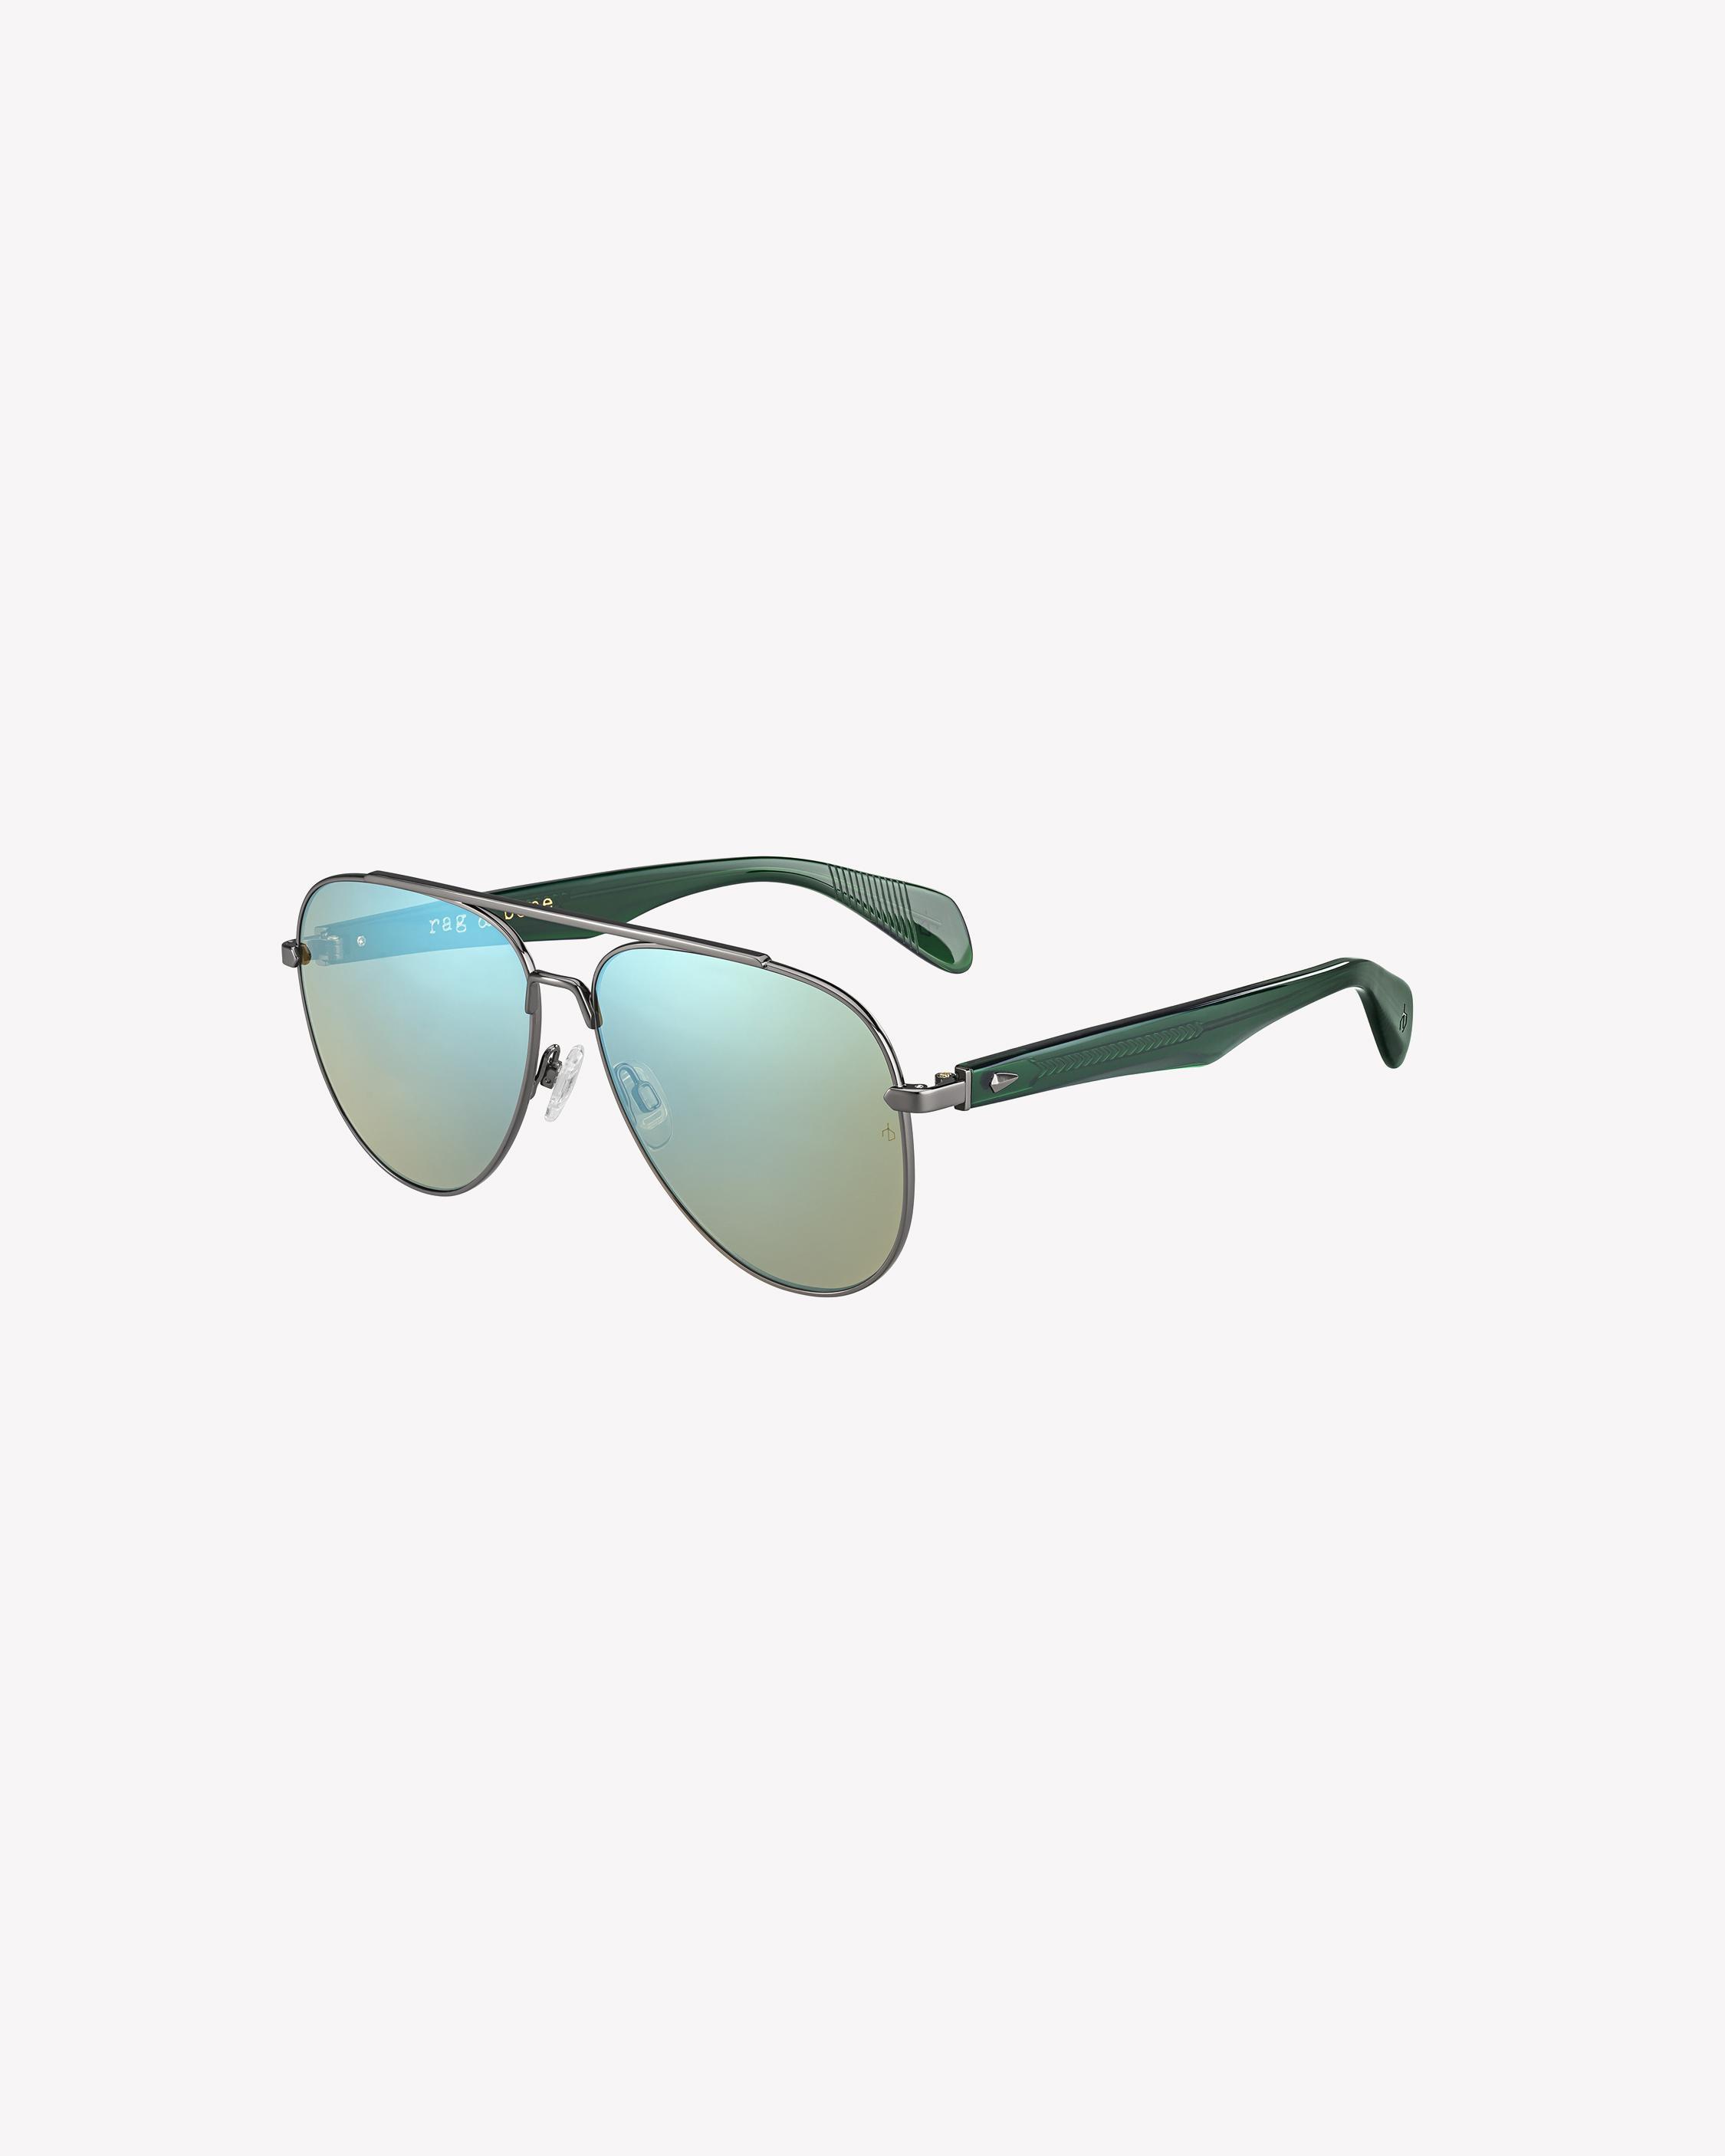 a69ed468dd25 Arc | Accessories Sunglasses | rag & bone